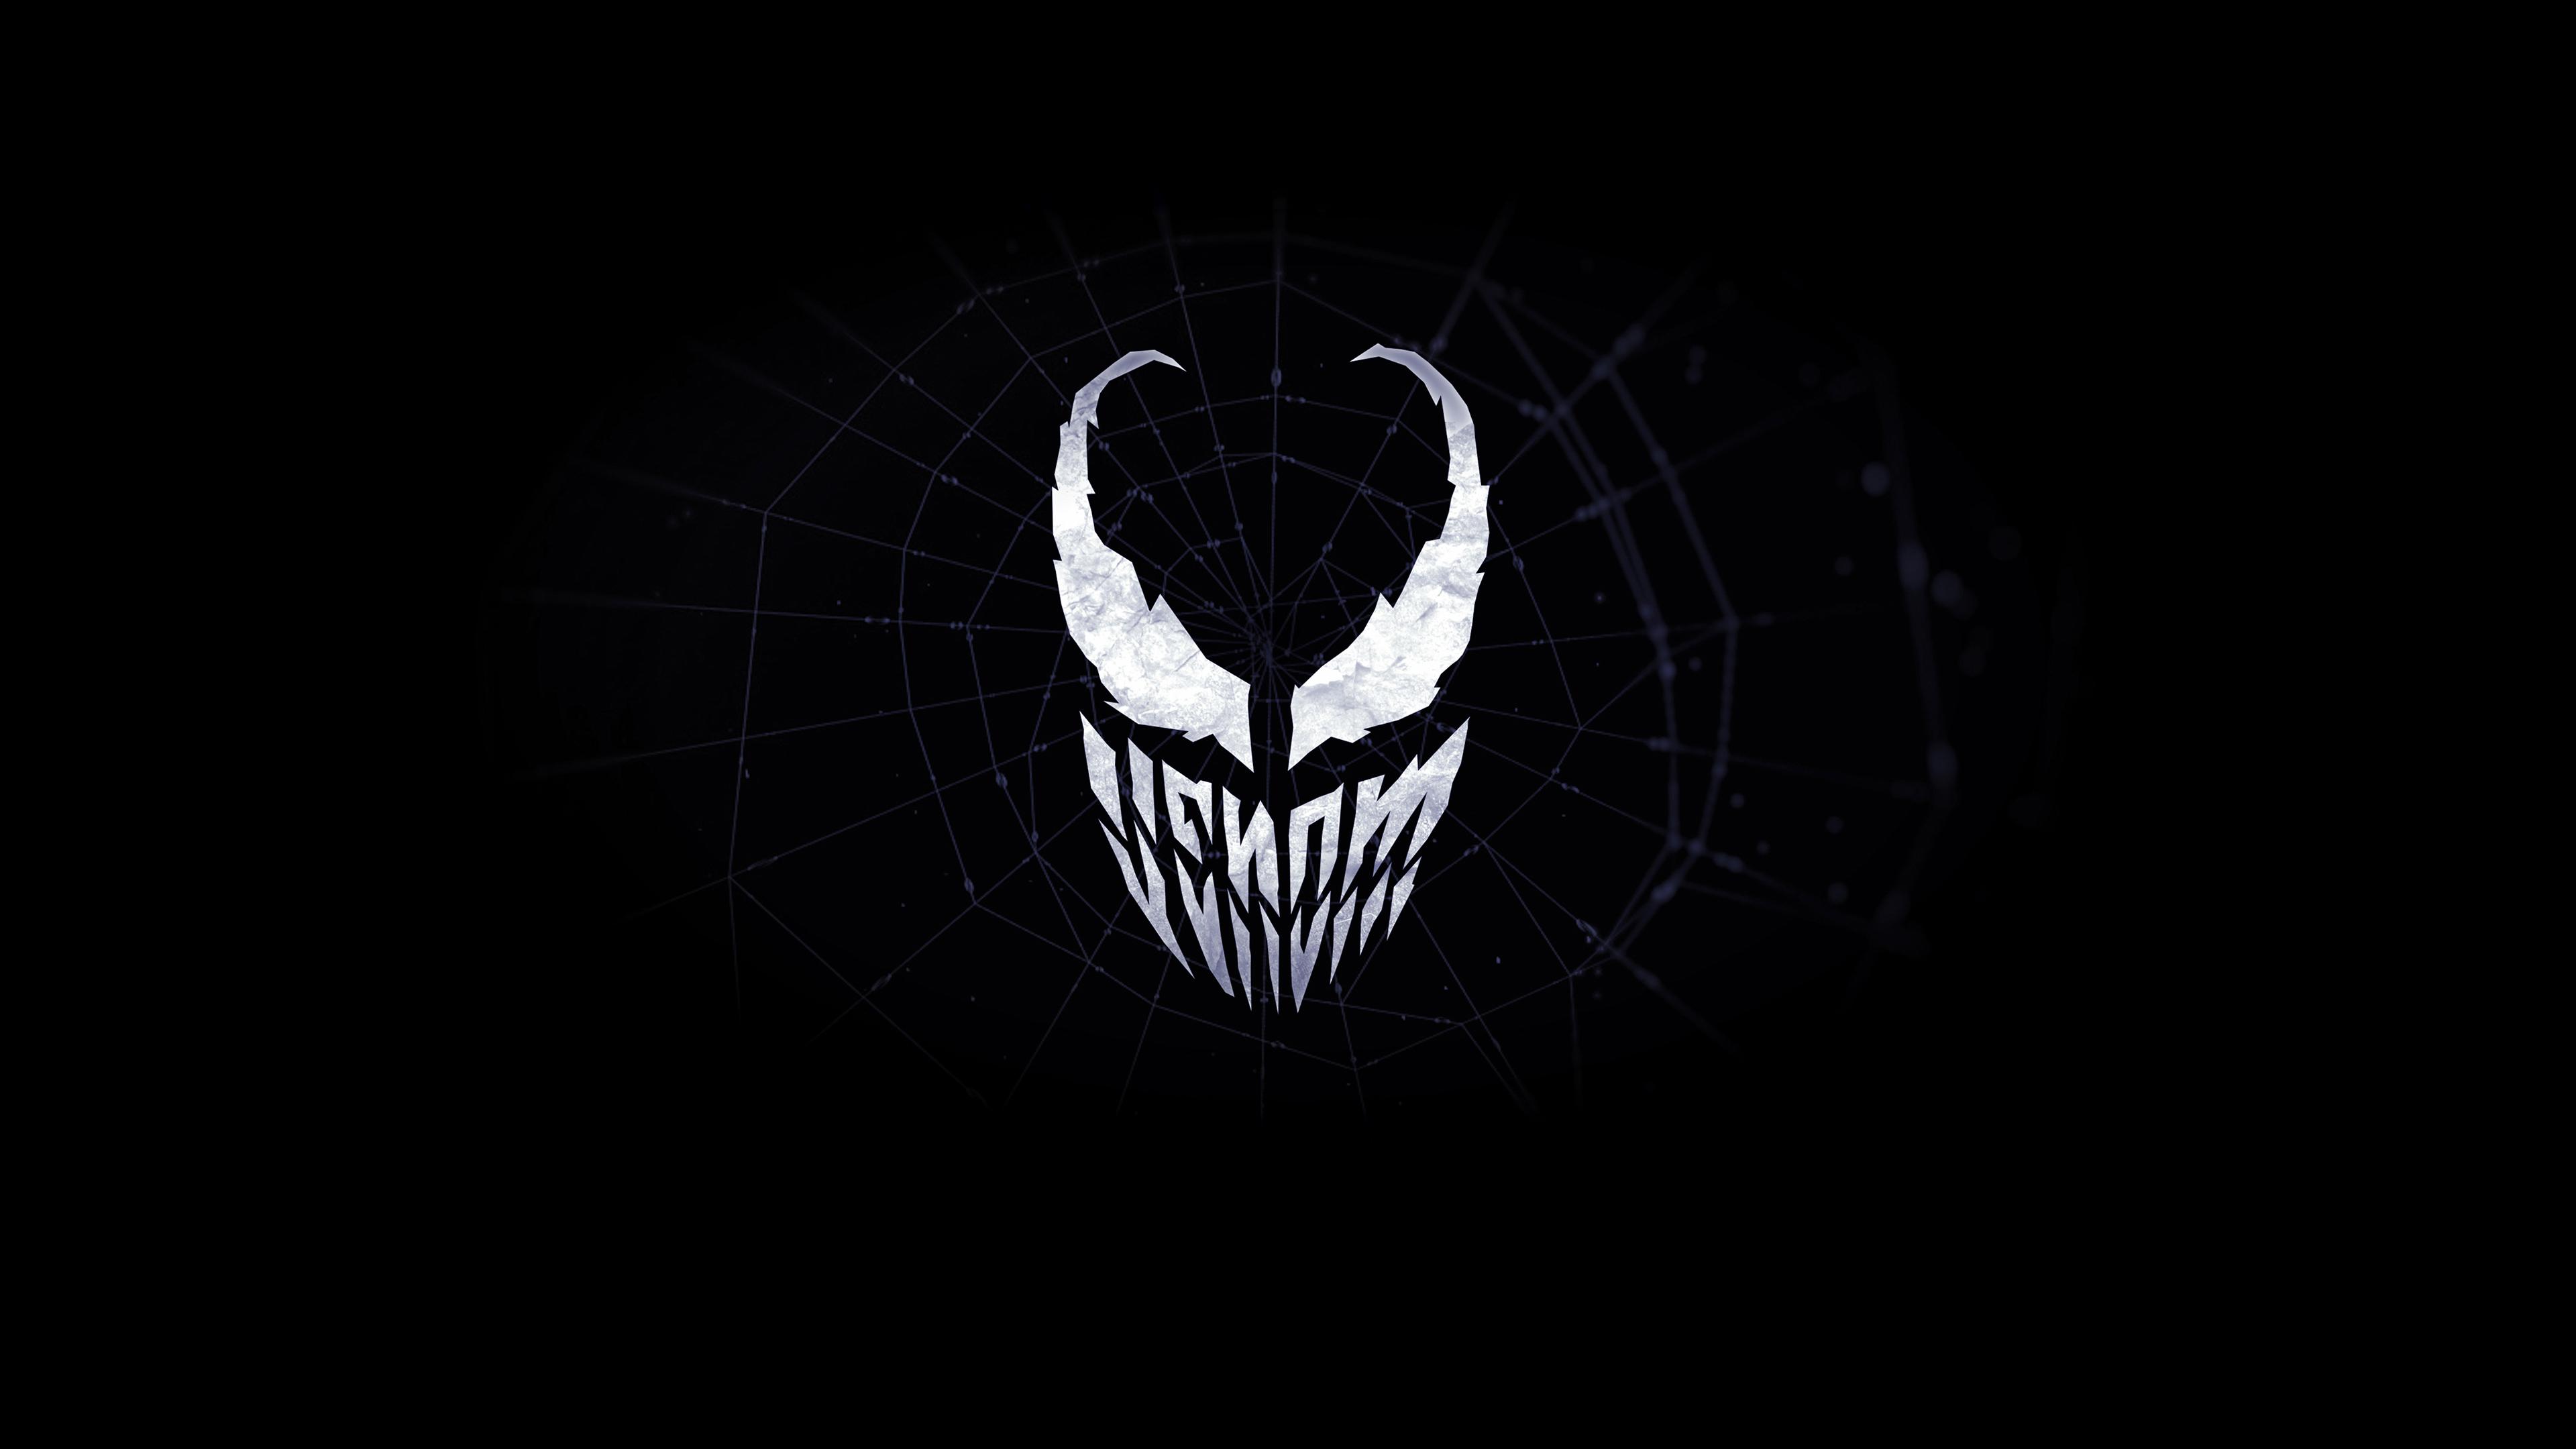 Venom Minimalist Logo 4k, HD Superheroes, 4k Wallpapers ...